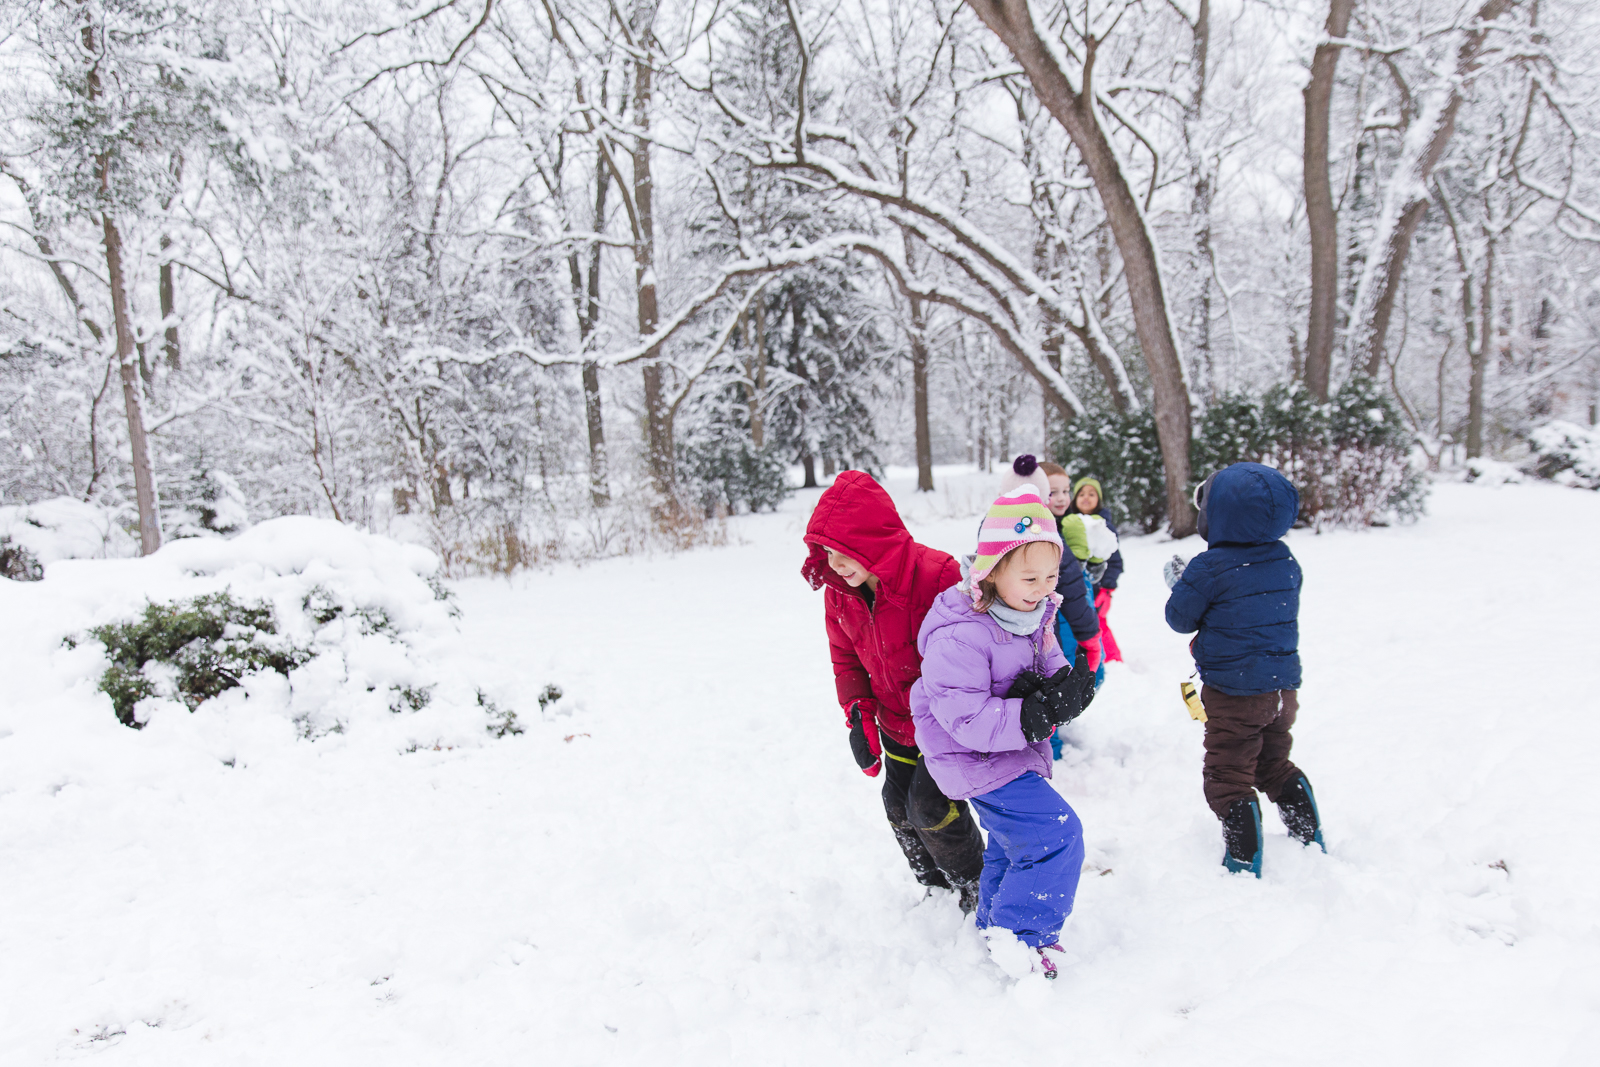 Primary snow play